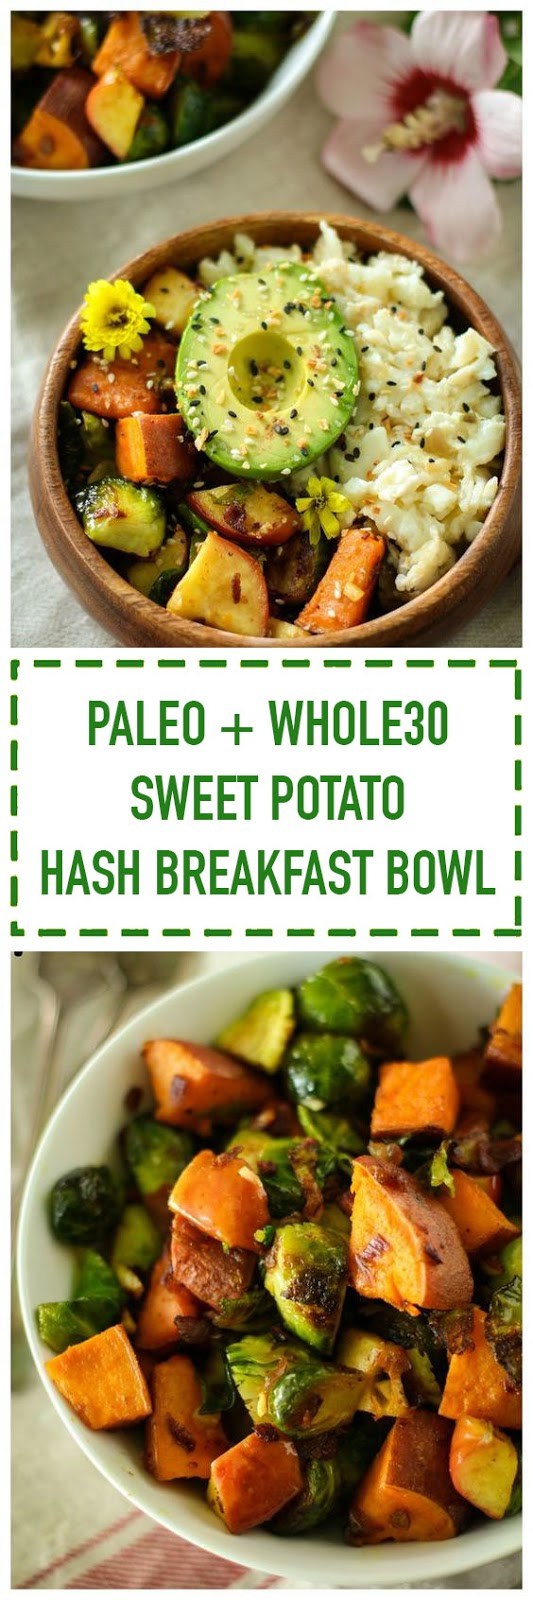 Paleo Sweet Potato Hash Breakfast Bowl (Whole30)